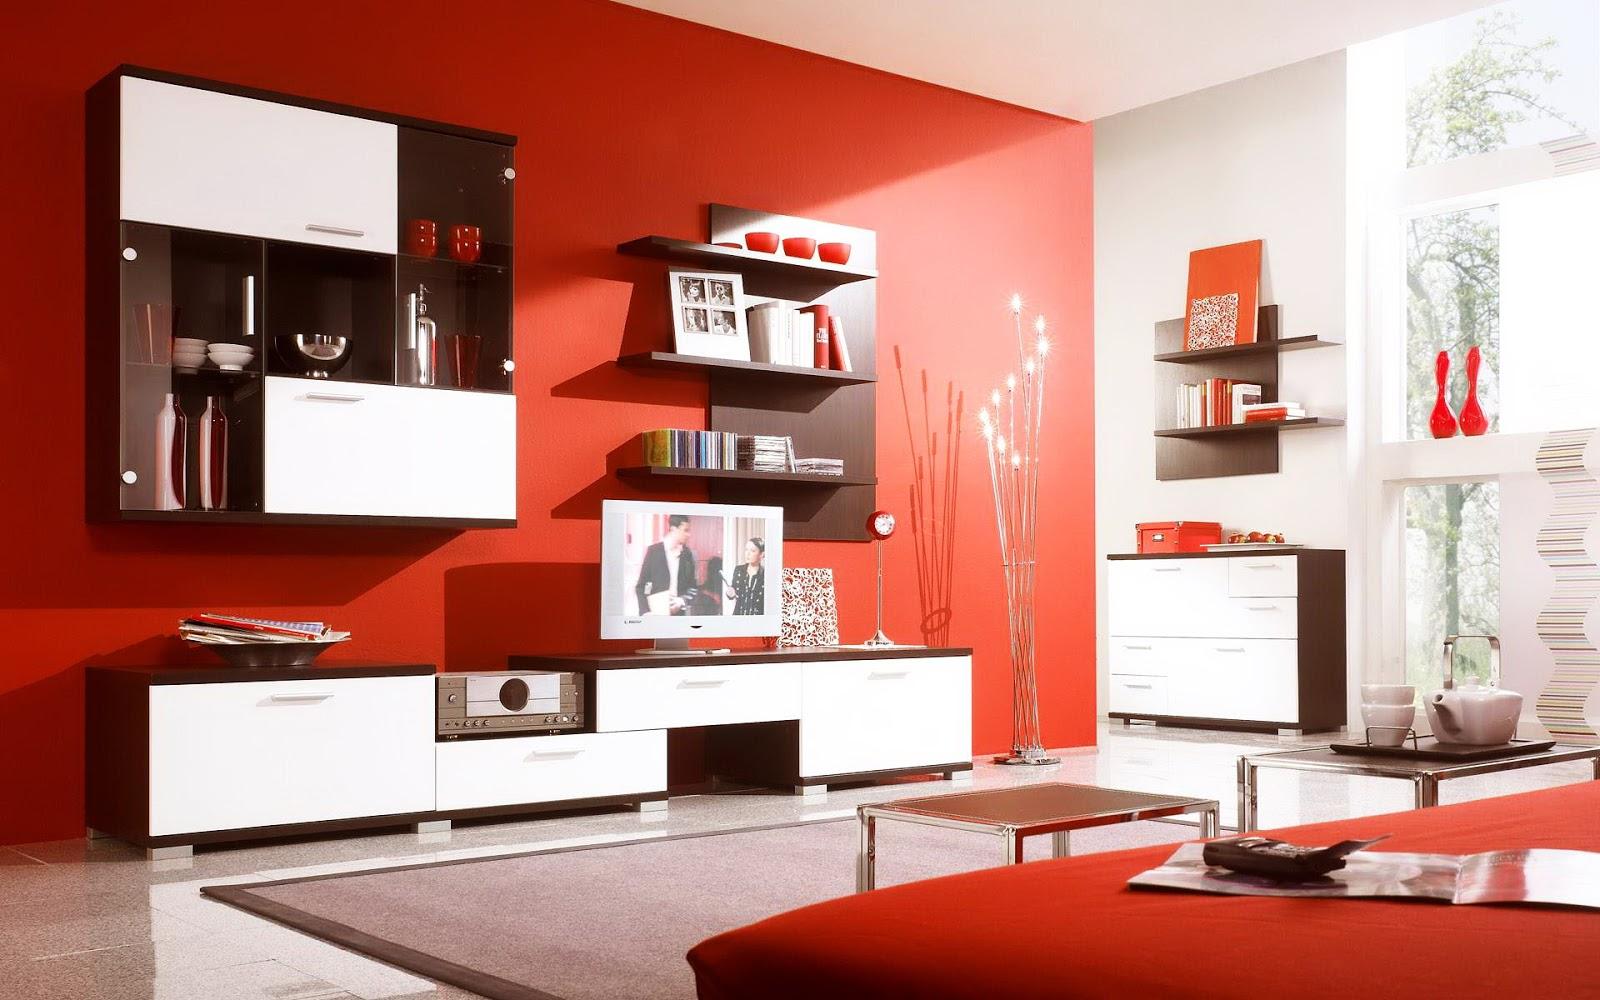 Muebles archivos for Decoracion salon muebles blancos